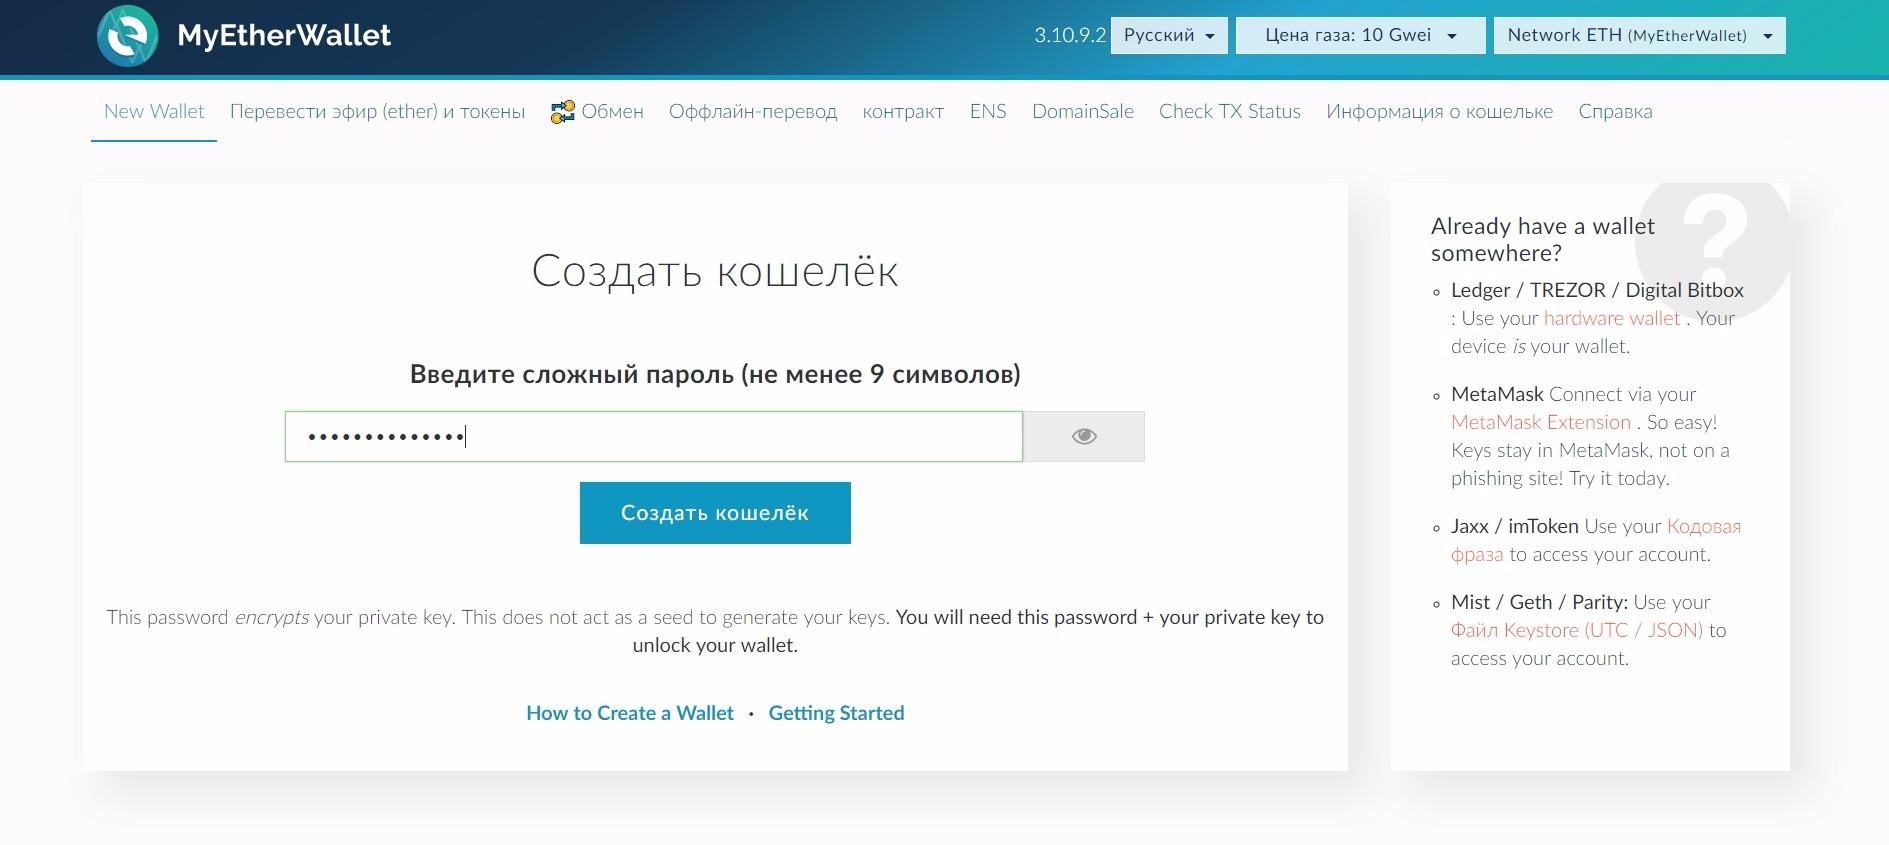 Myetherwallet.com - кошелек для Ethereum и токенов ico